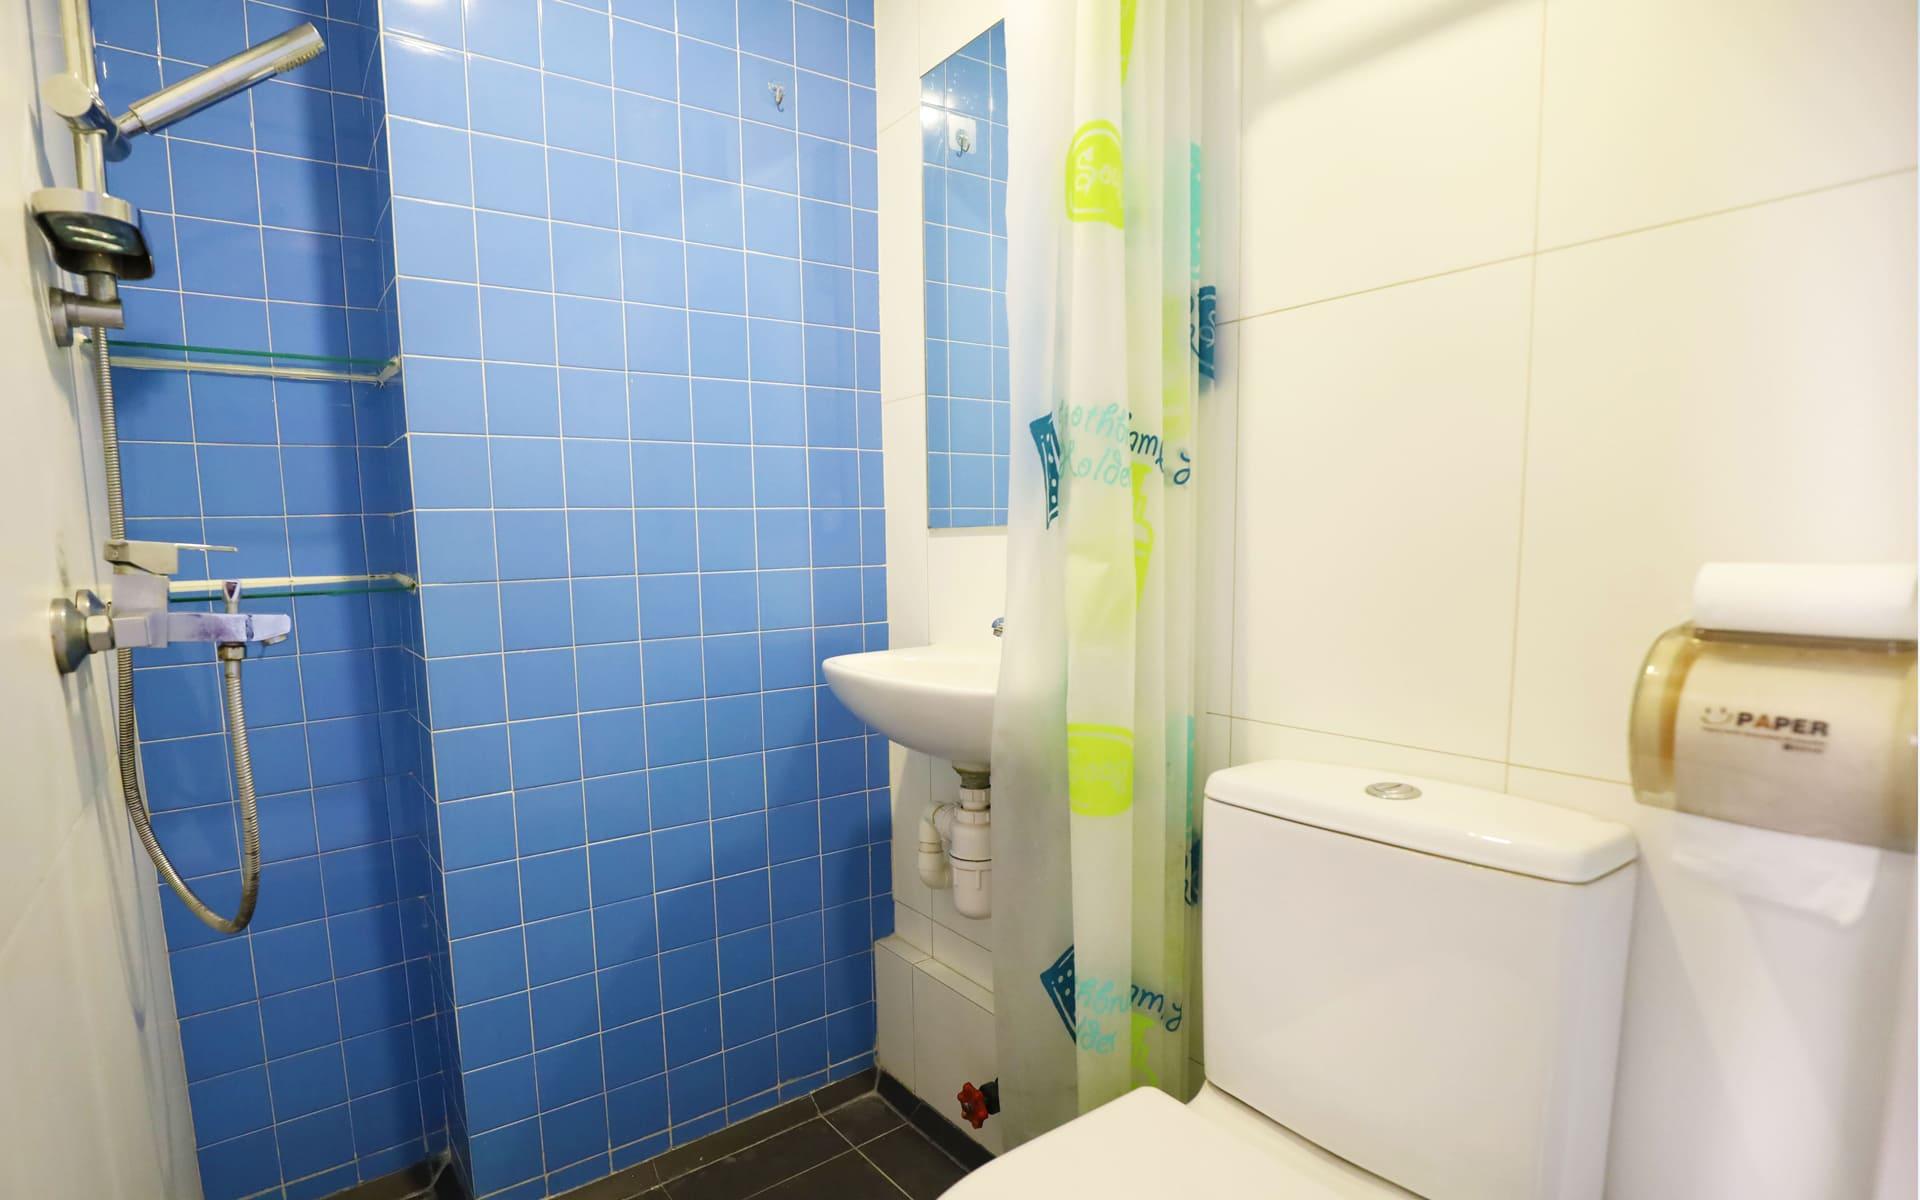 hk_service_apartment_1264957651596886710.jpg